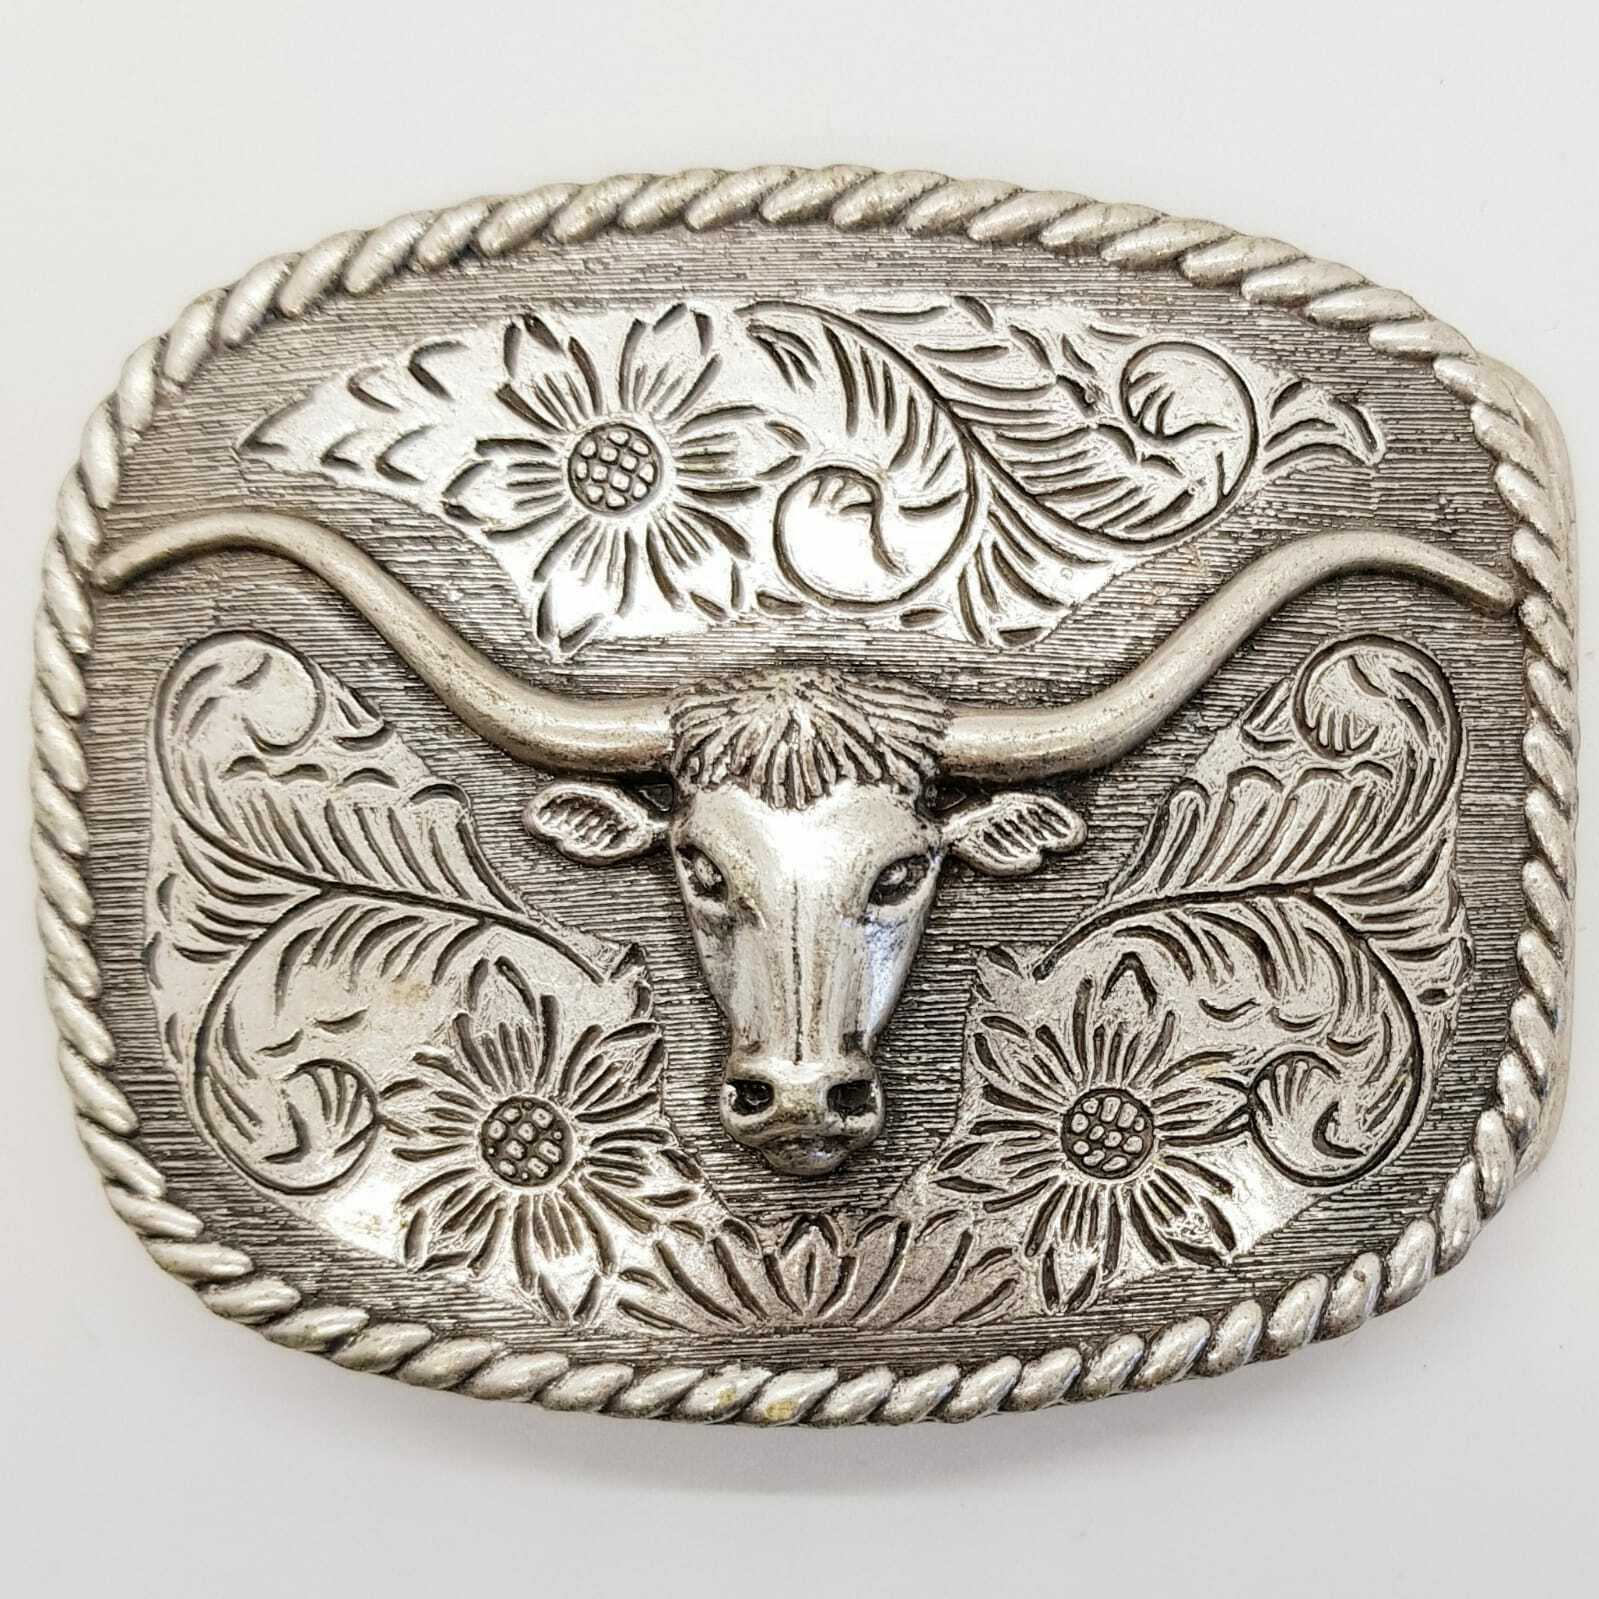 Longhorn Western Belt Buckle USA Cowboy Rodeo Bull Head Ox Texas Biker chrome